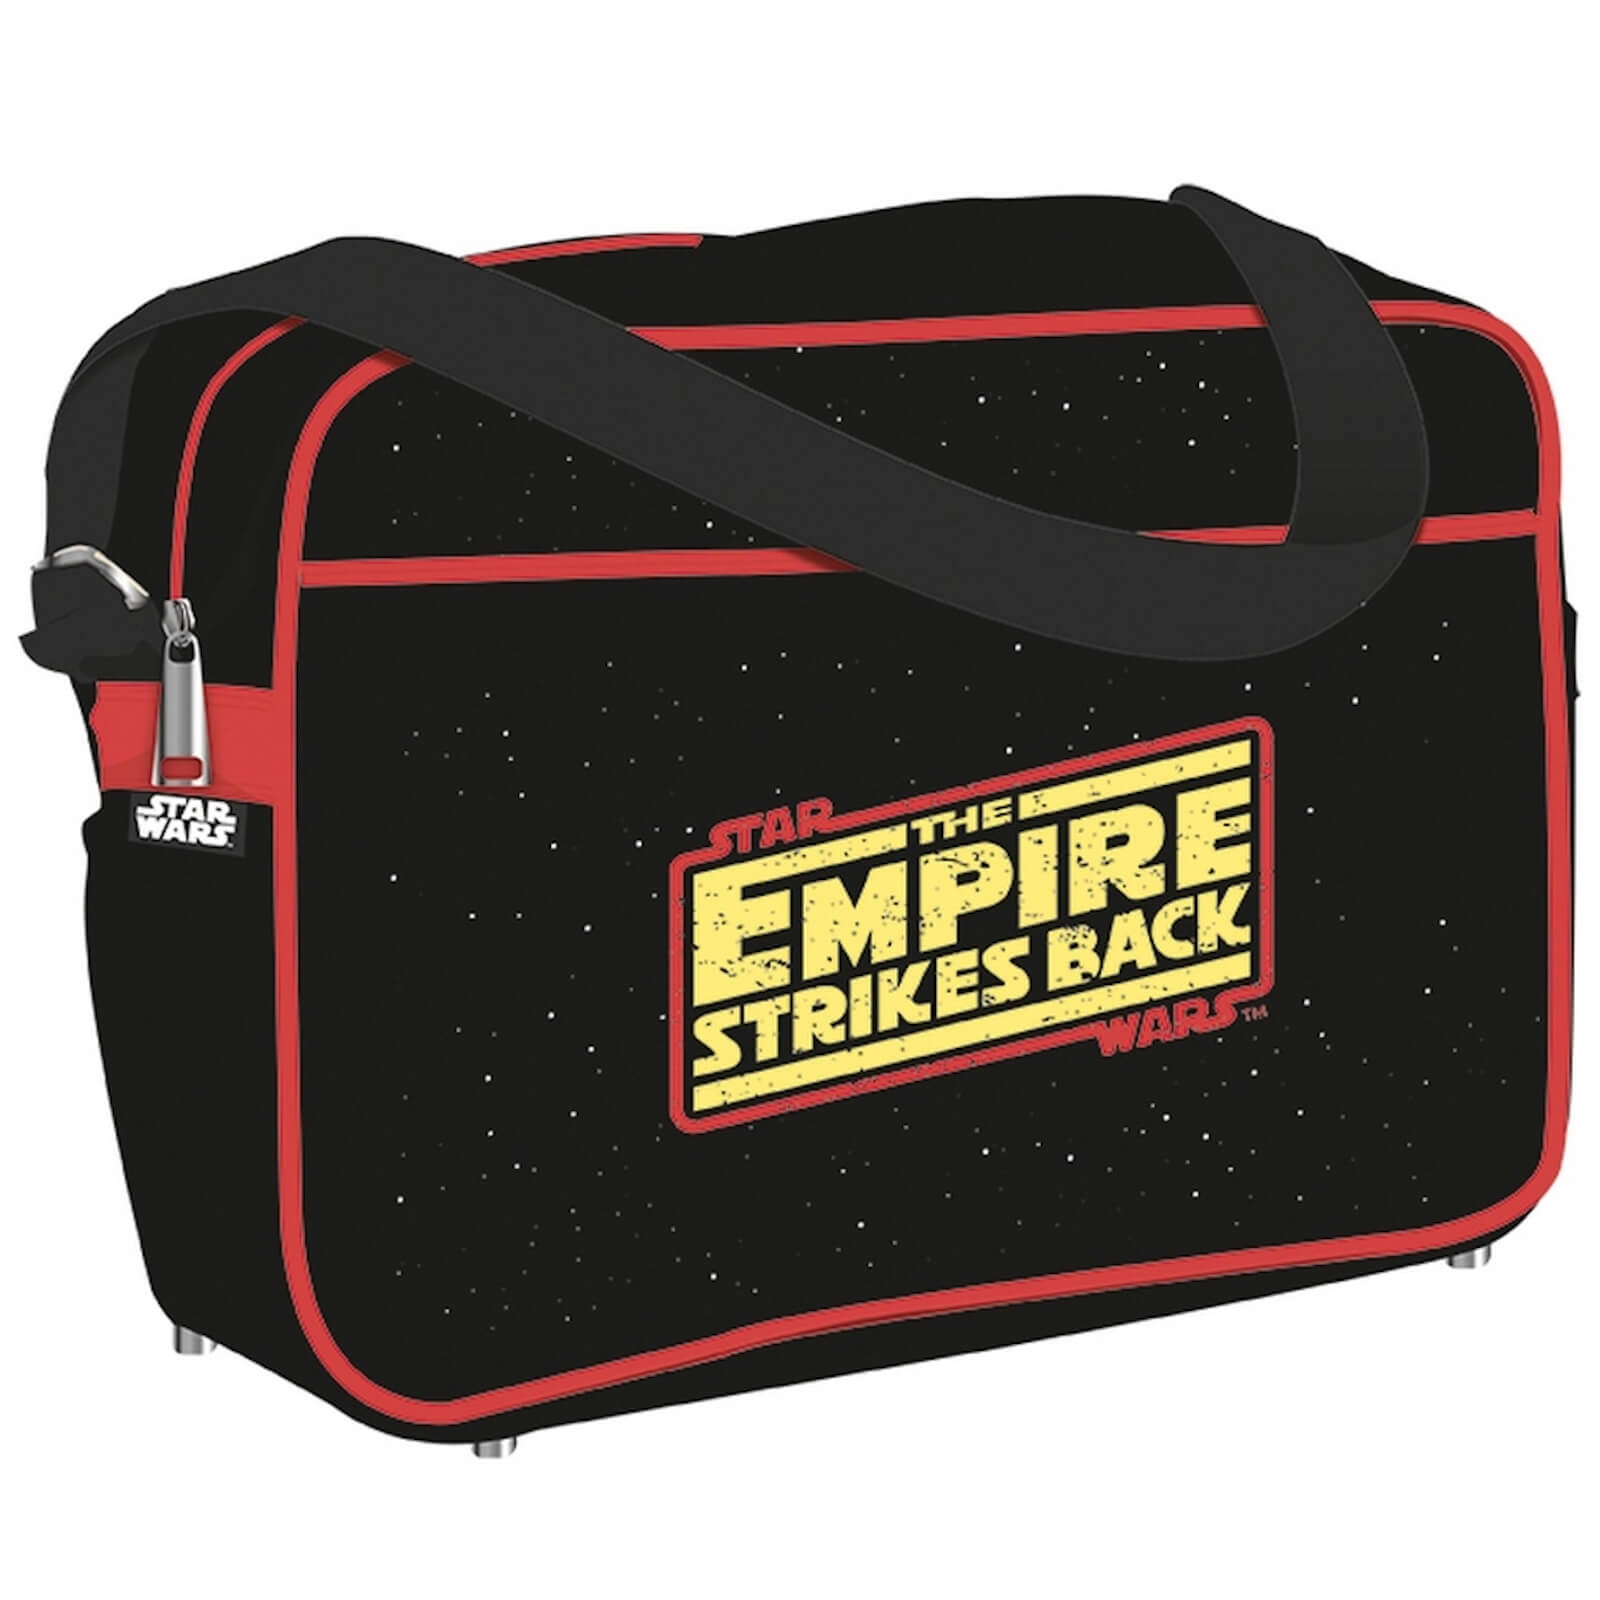 Image of Star Wars The Empire Strikes Back Retro Bag